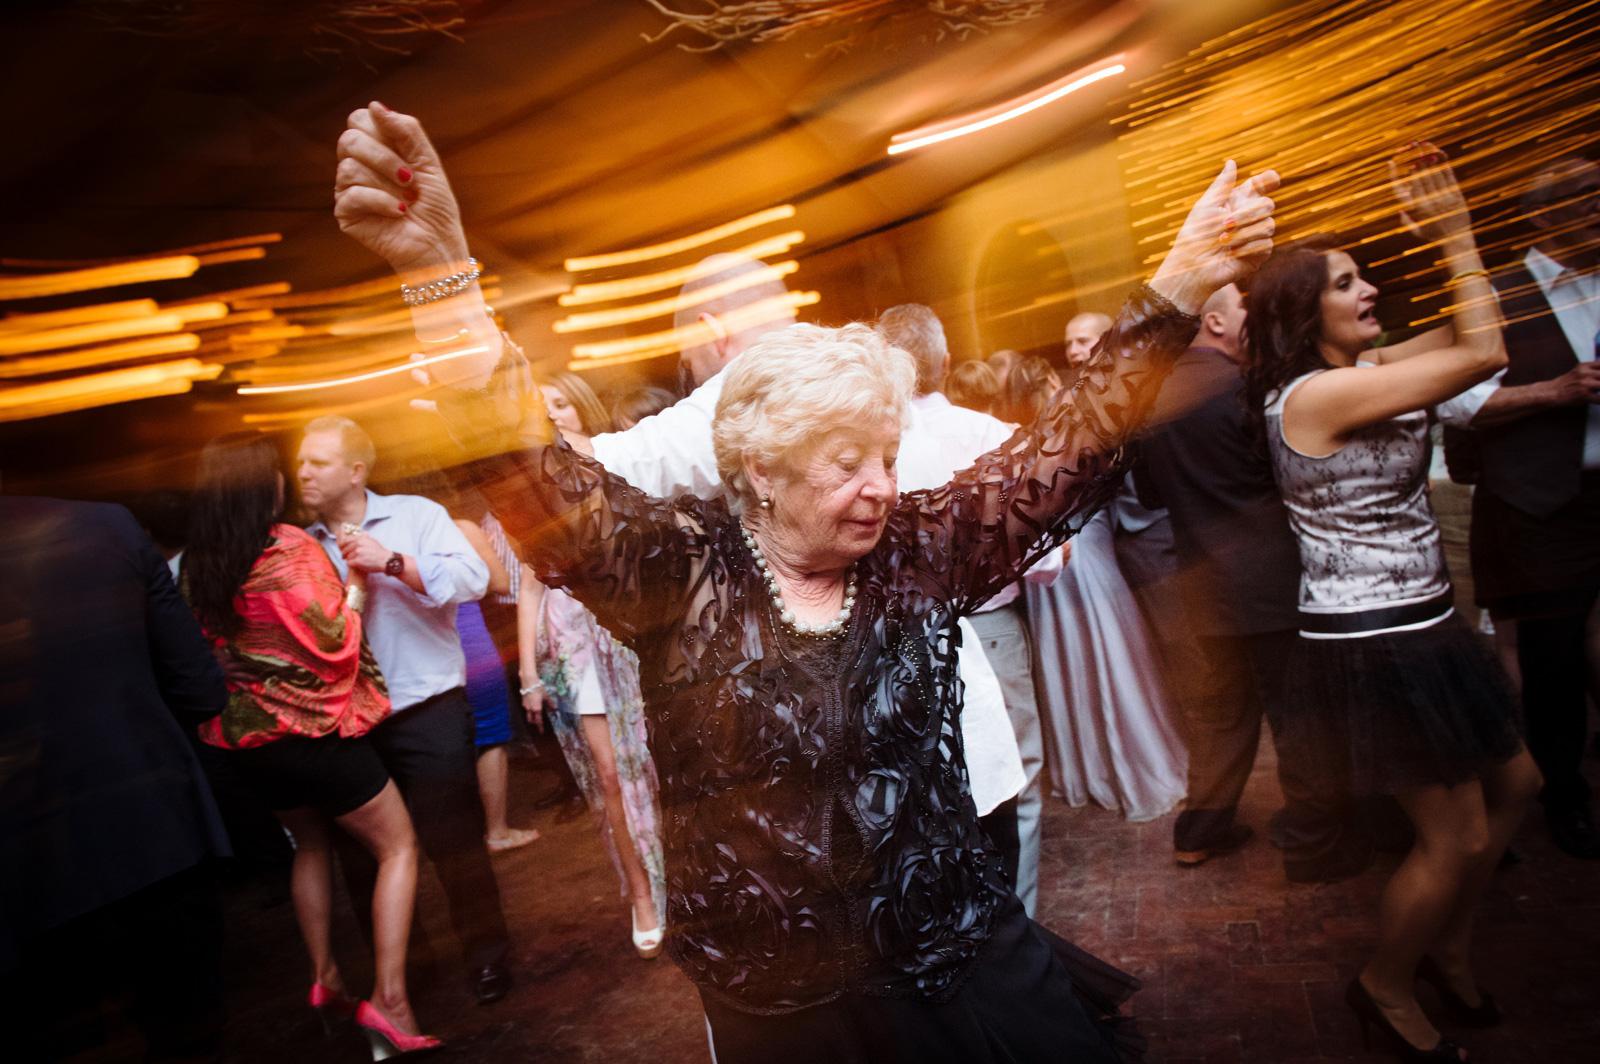 Dancing-Jacki-Bruniquel-Hoorah014